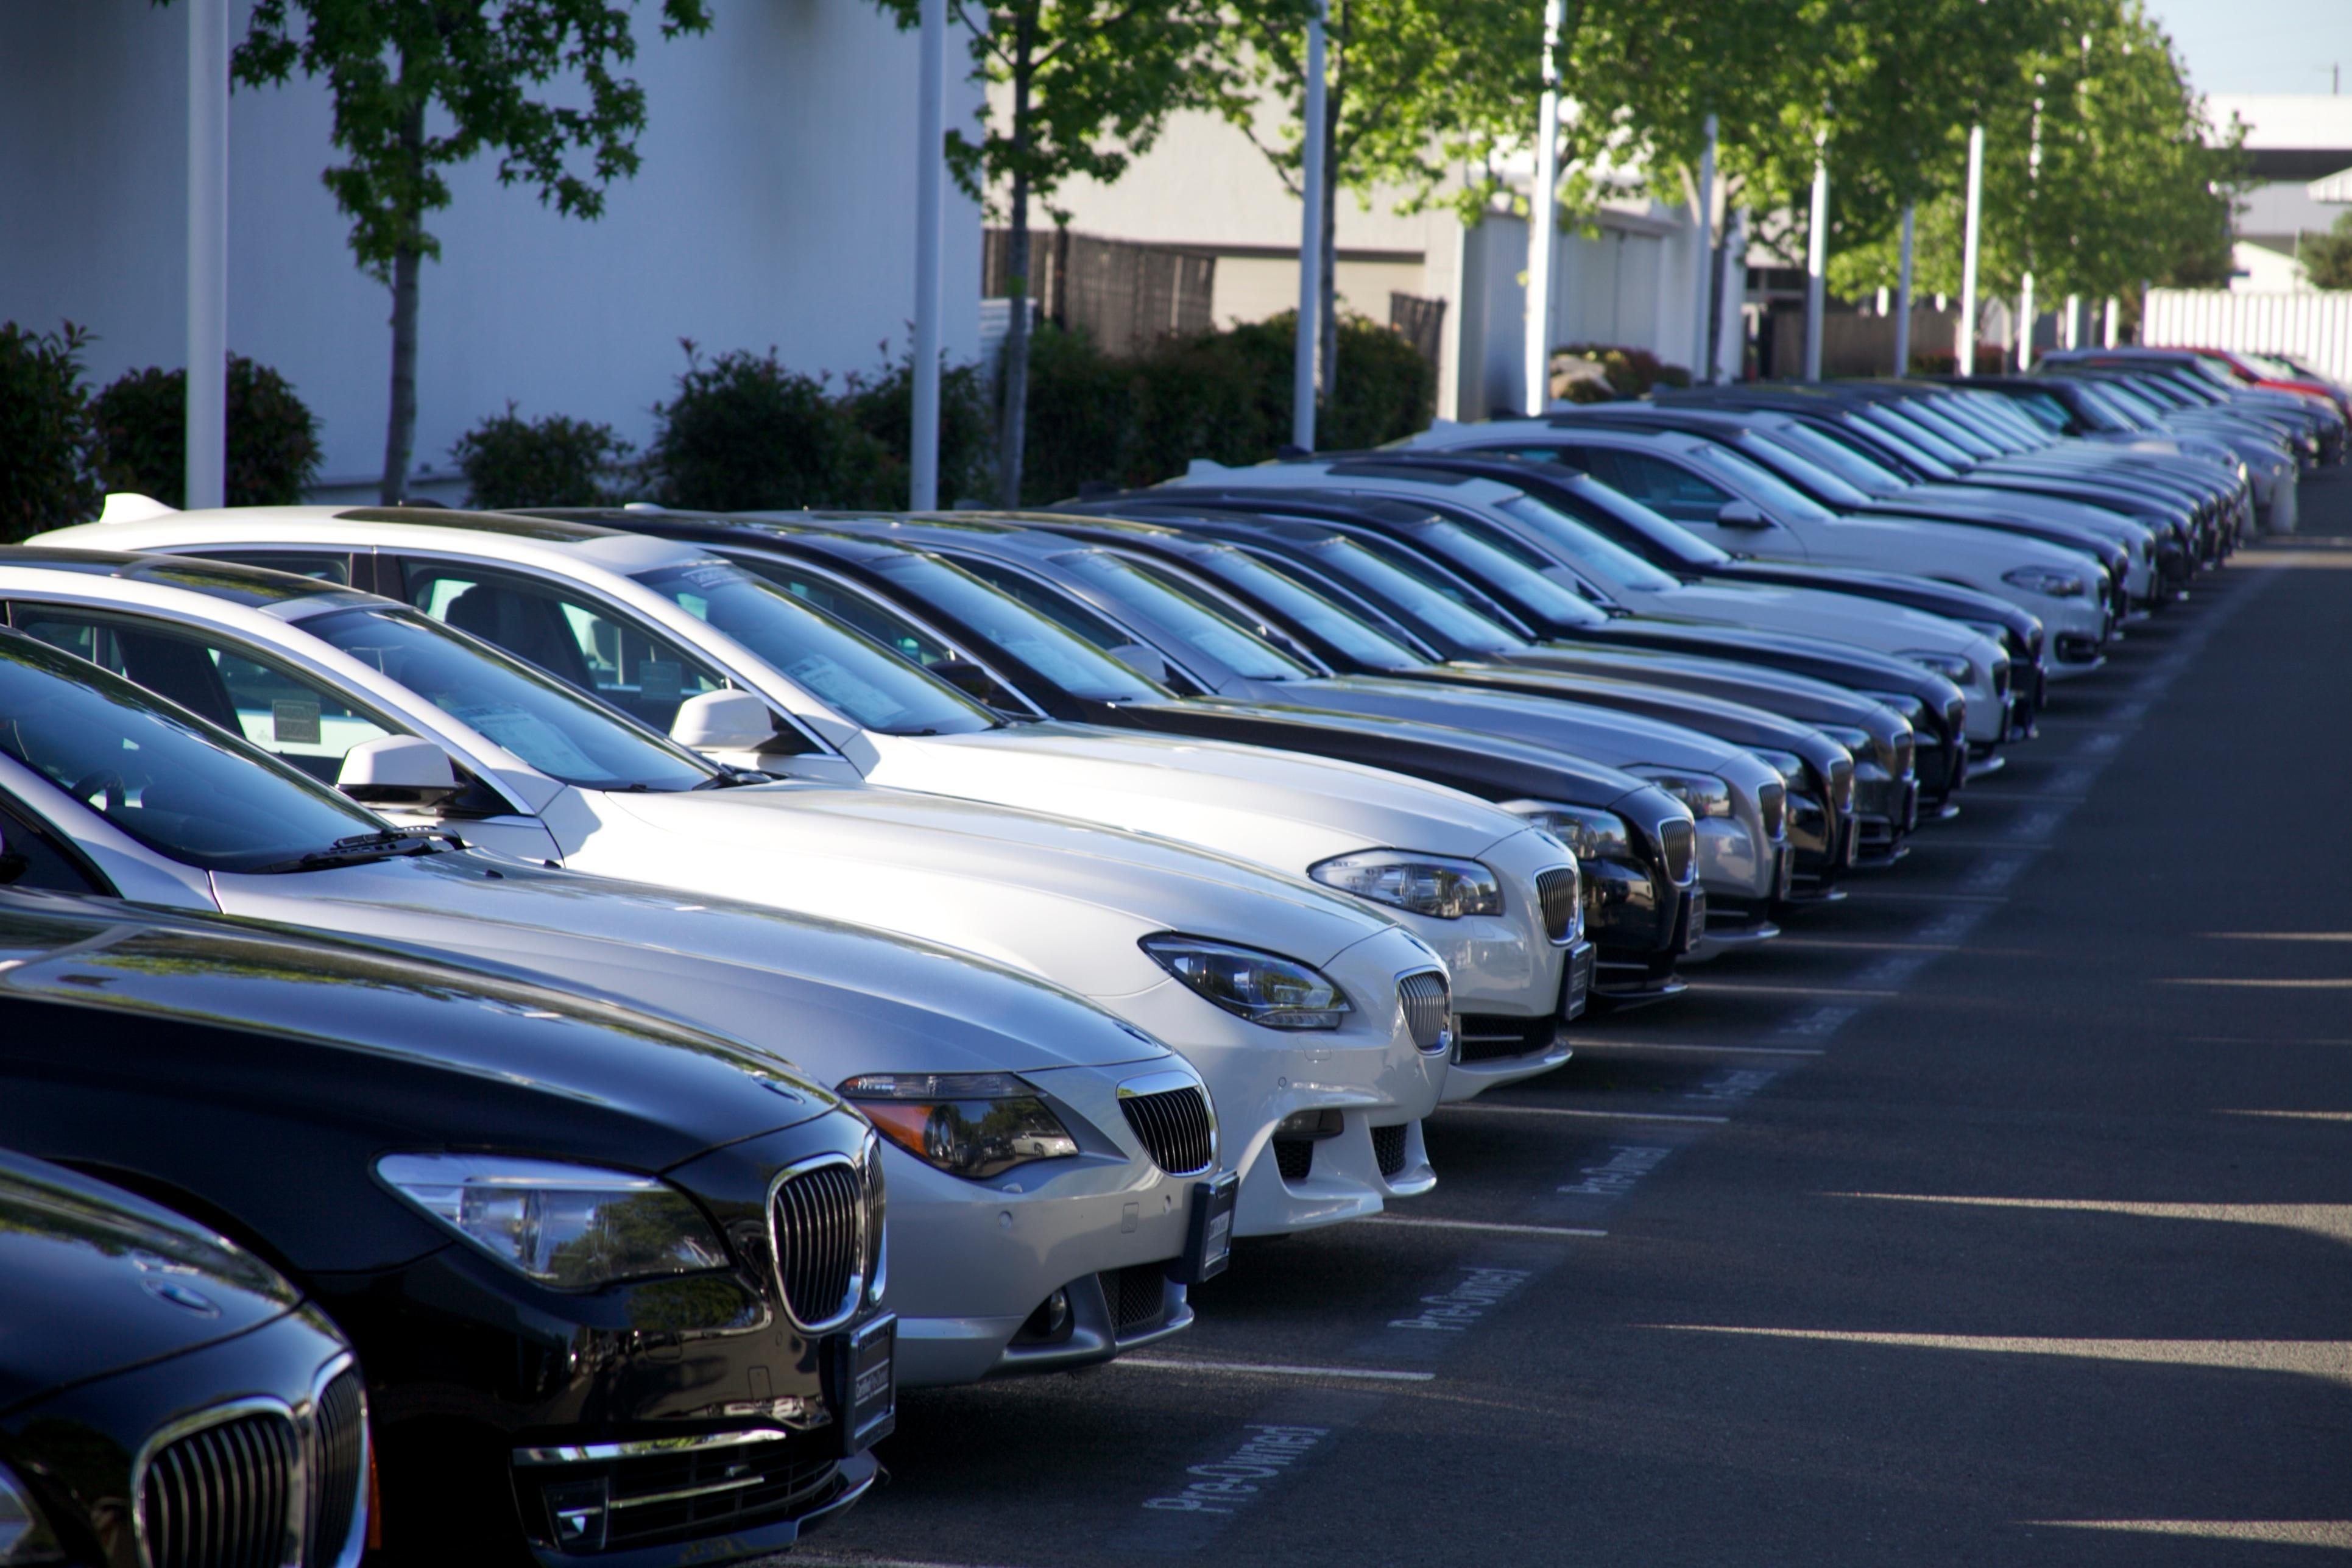 BMW Dealership Of Concord, East Bay, San